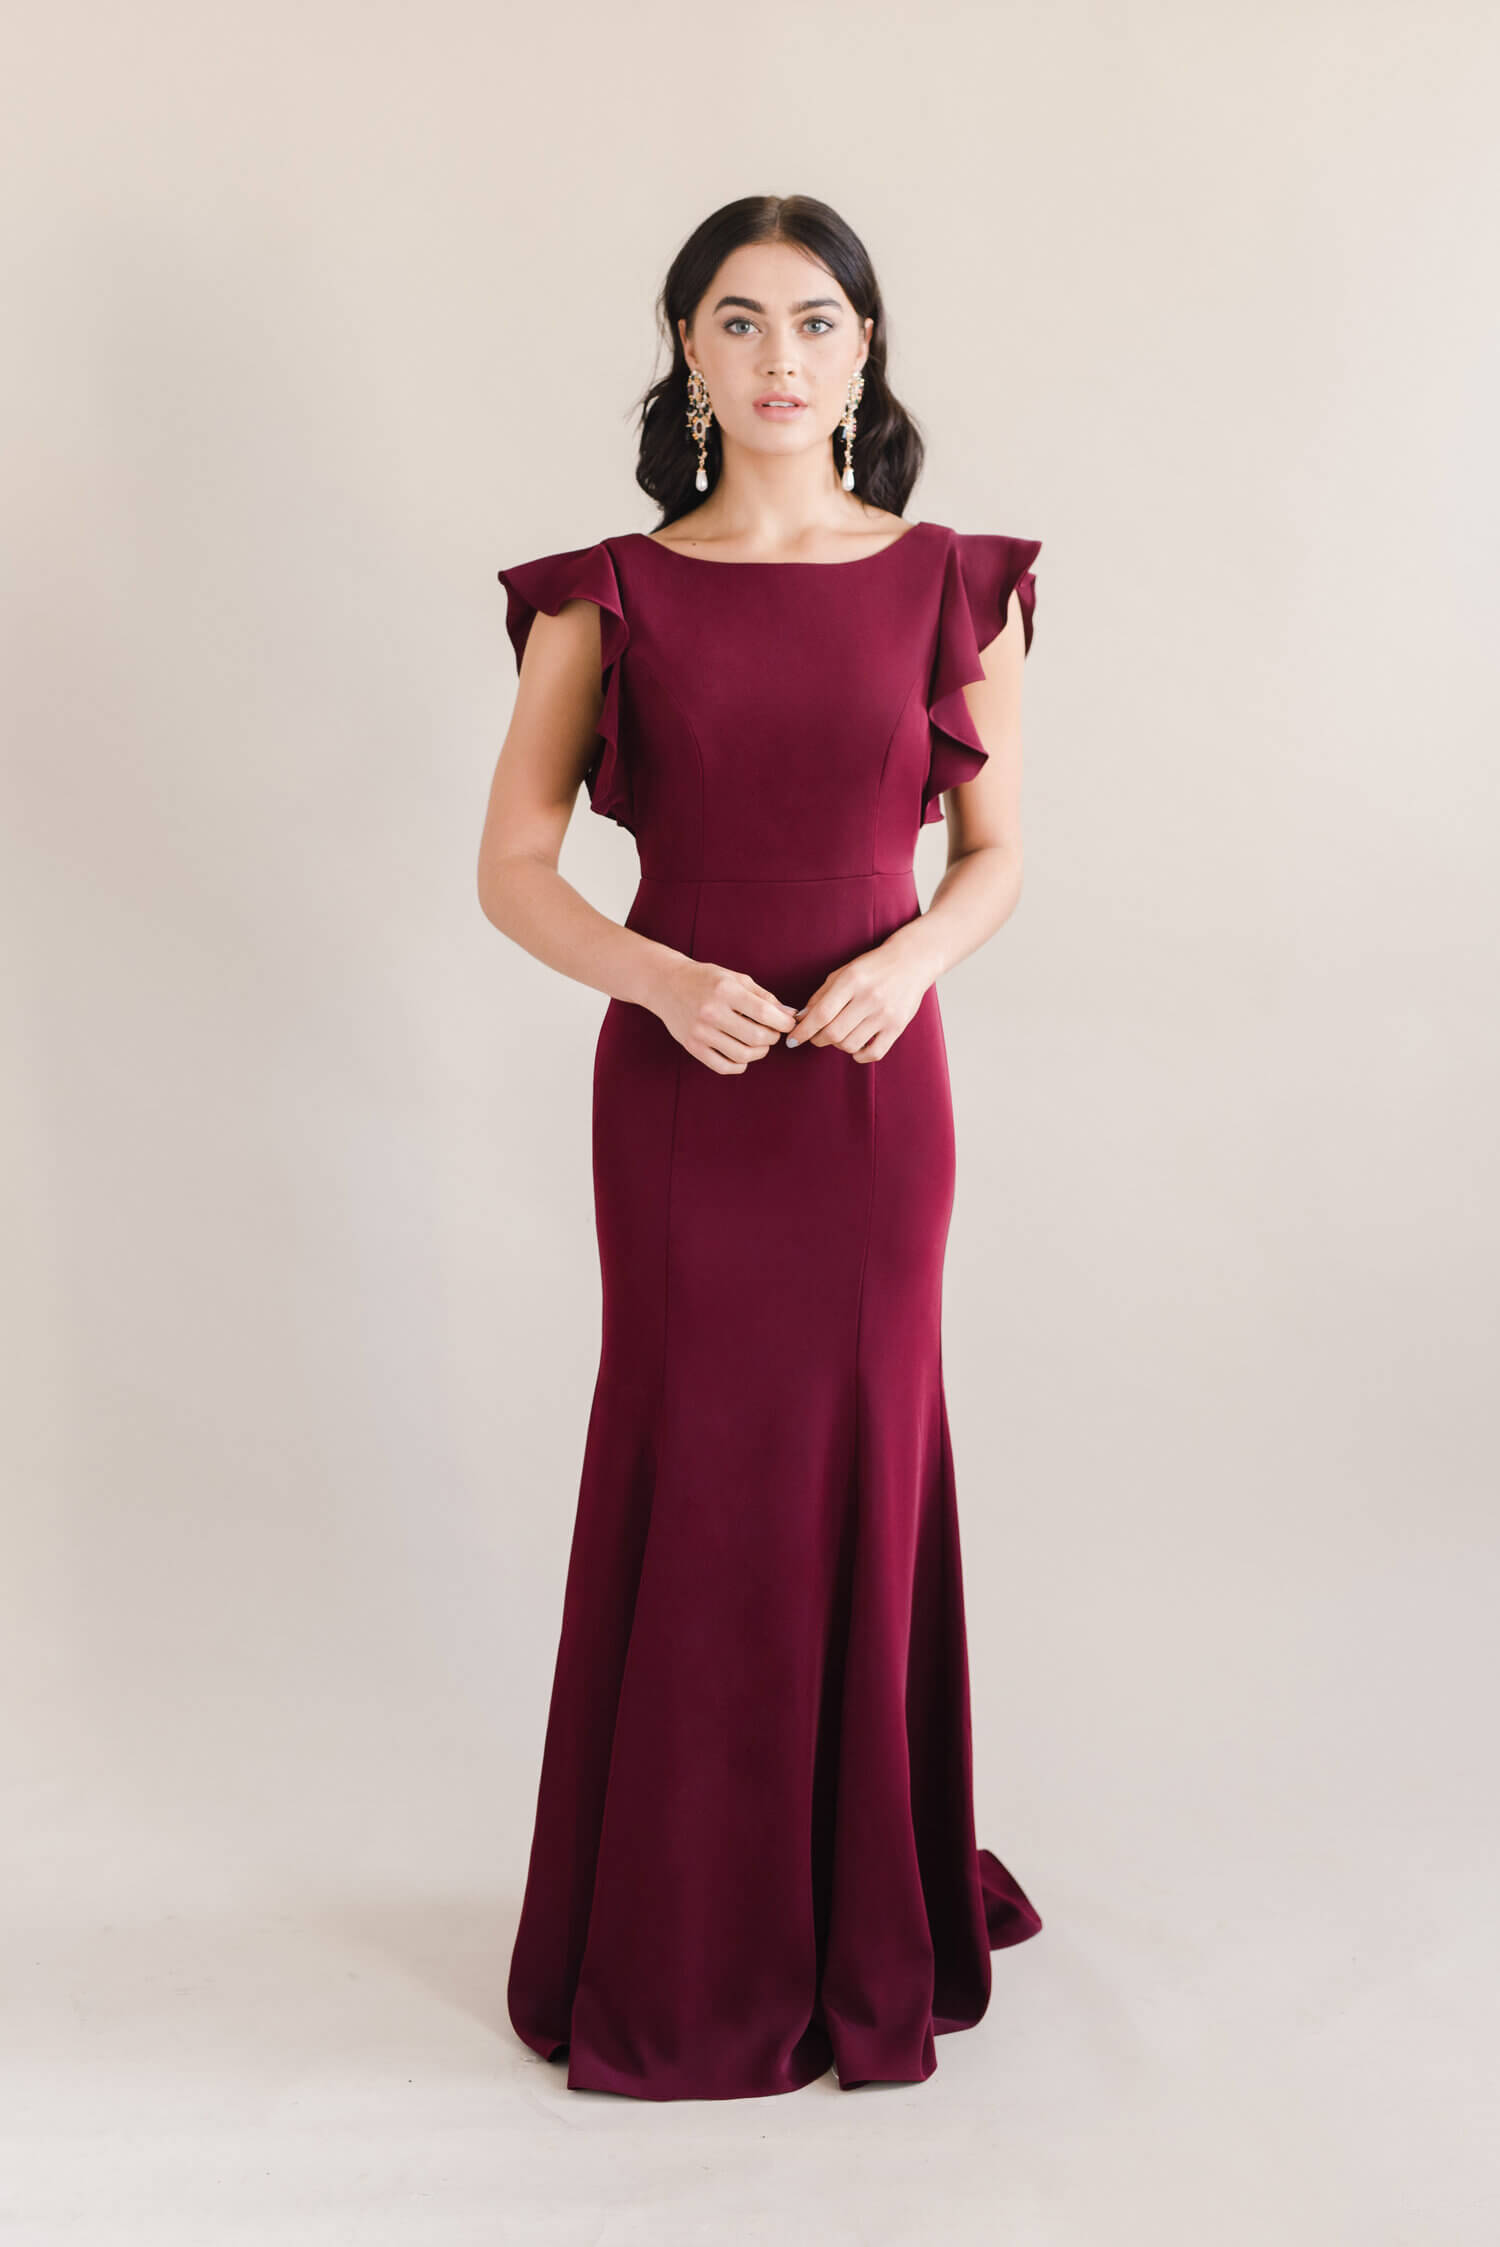 TH&H Cecelia Bridesmaid Dress TH&H Bridesmaid Dress Roseberry Burgundy